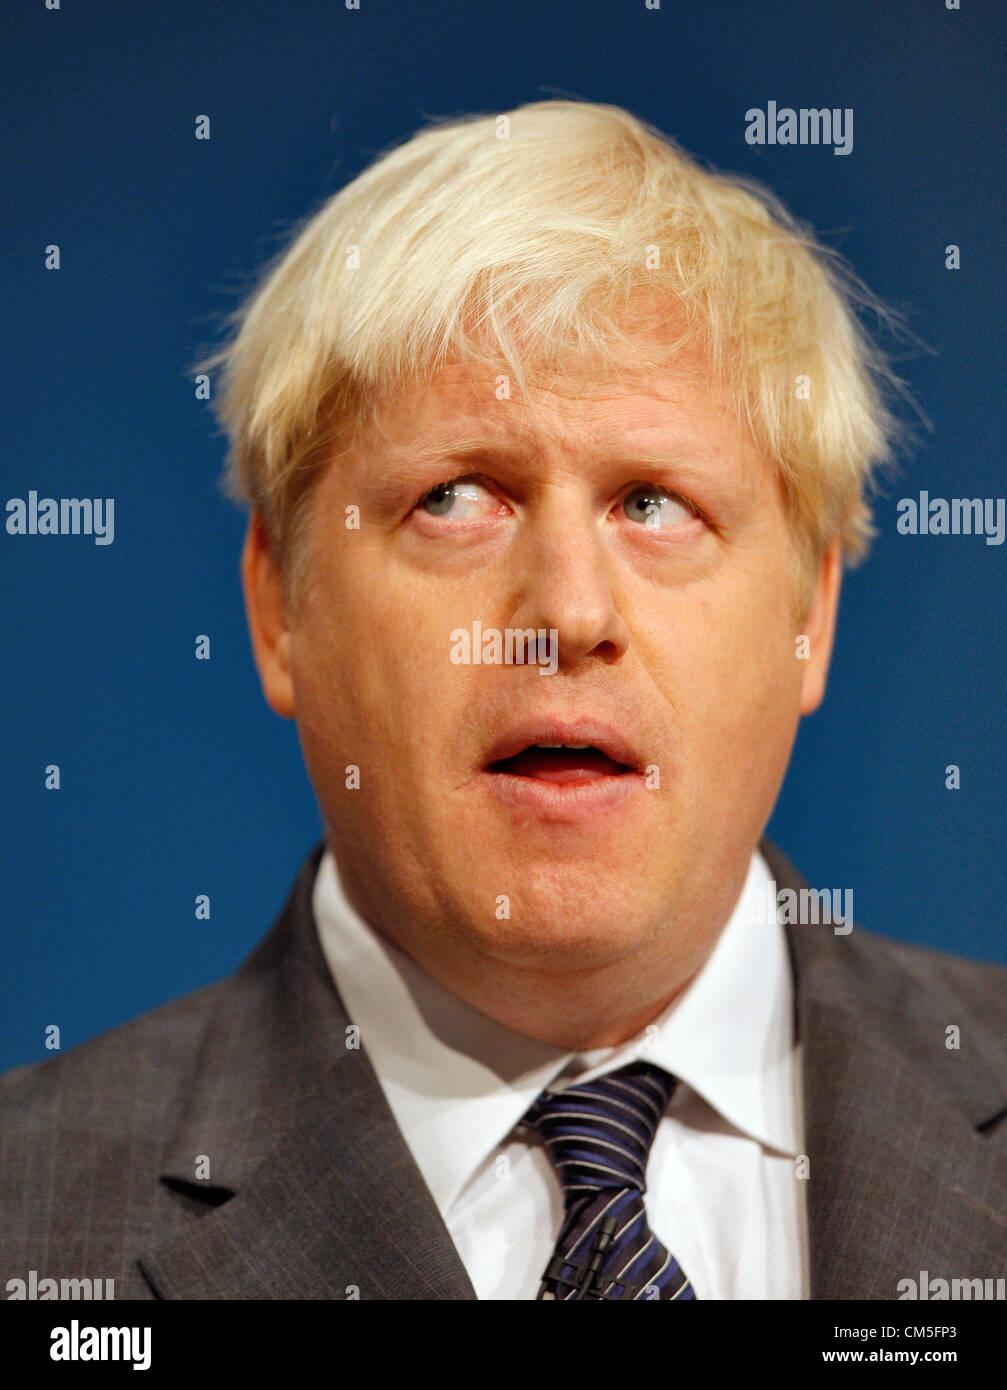 BORIS JOHNSON MAYOR OF LONDON 09 October 2012 THE ICC BIRMINGHAM ENGLAND - Stock Image